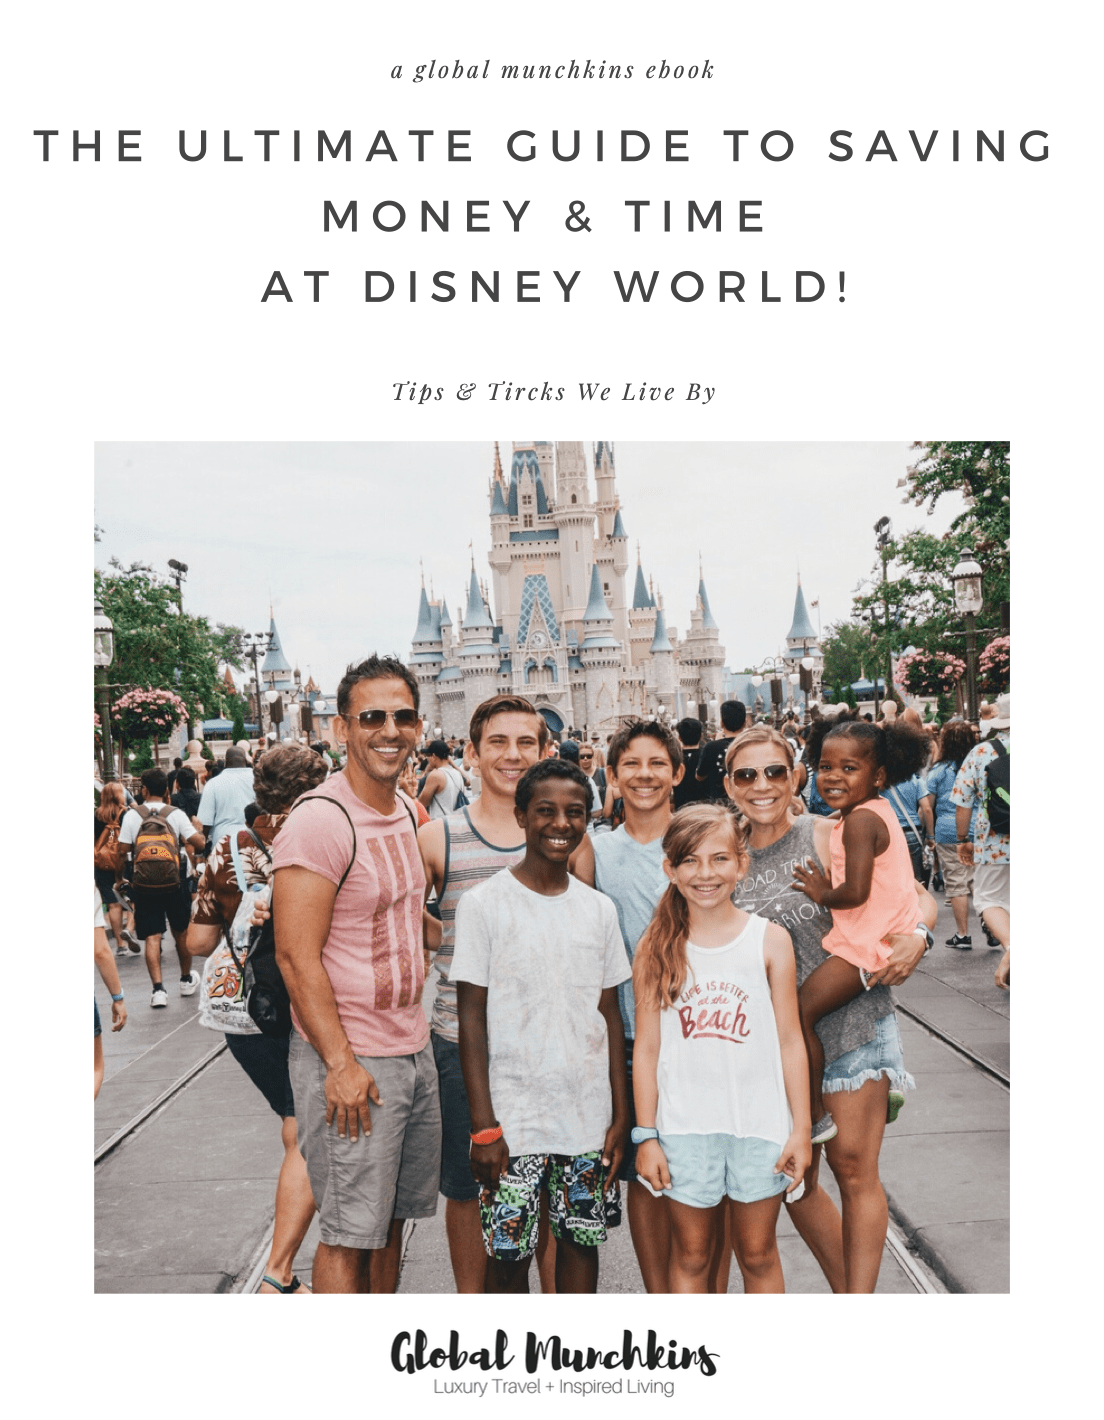 Disney World Money Saving E-Book!